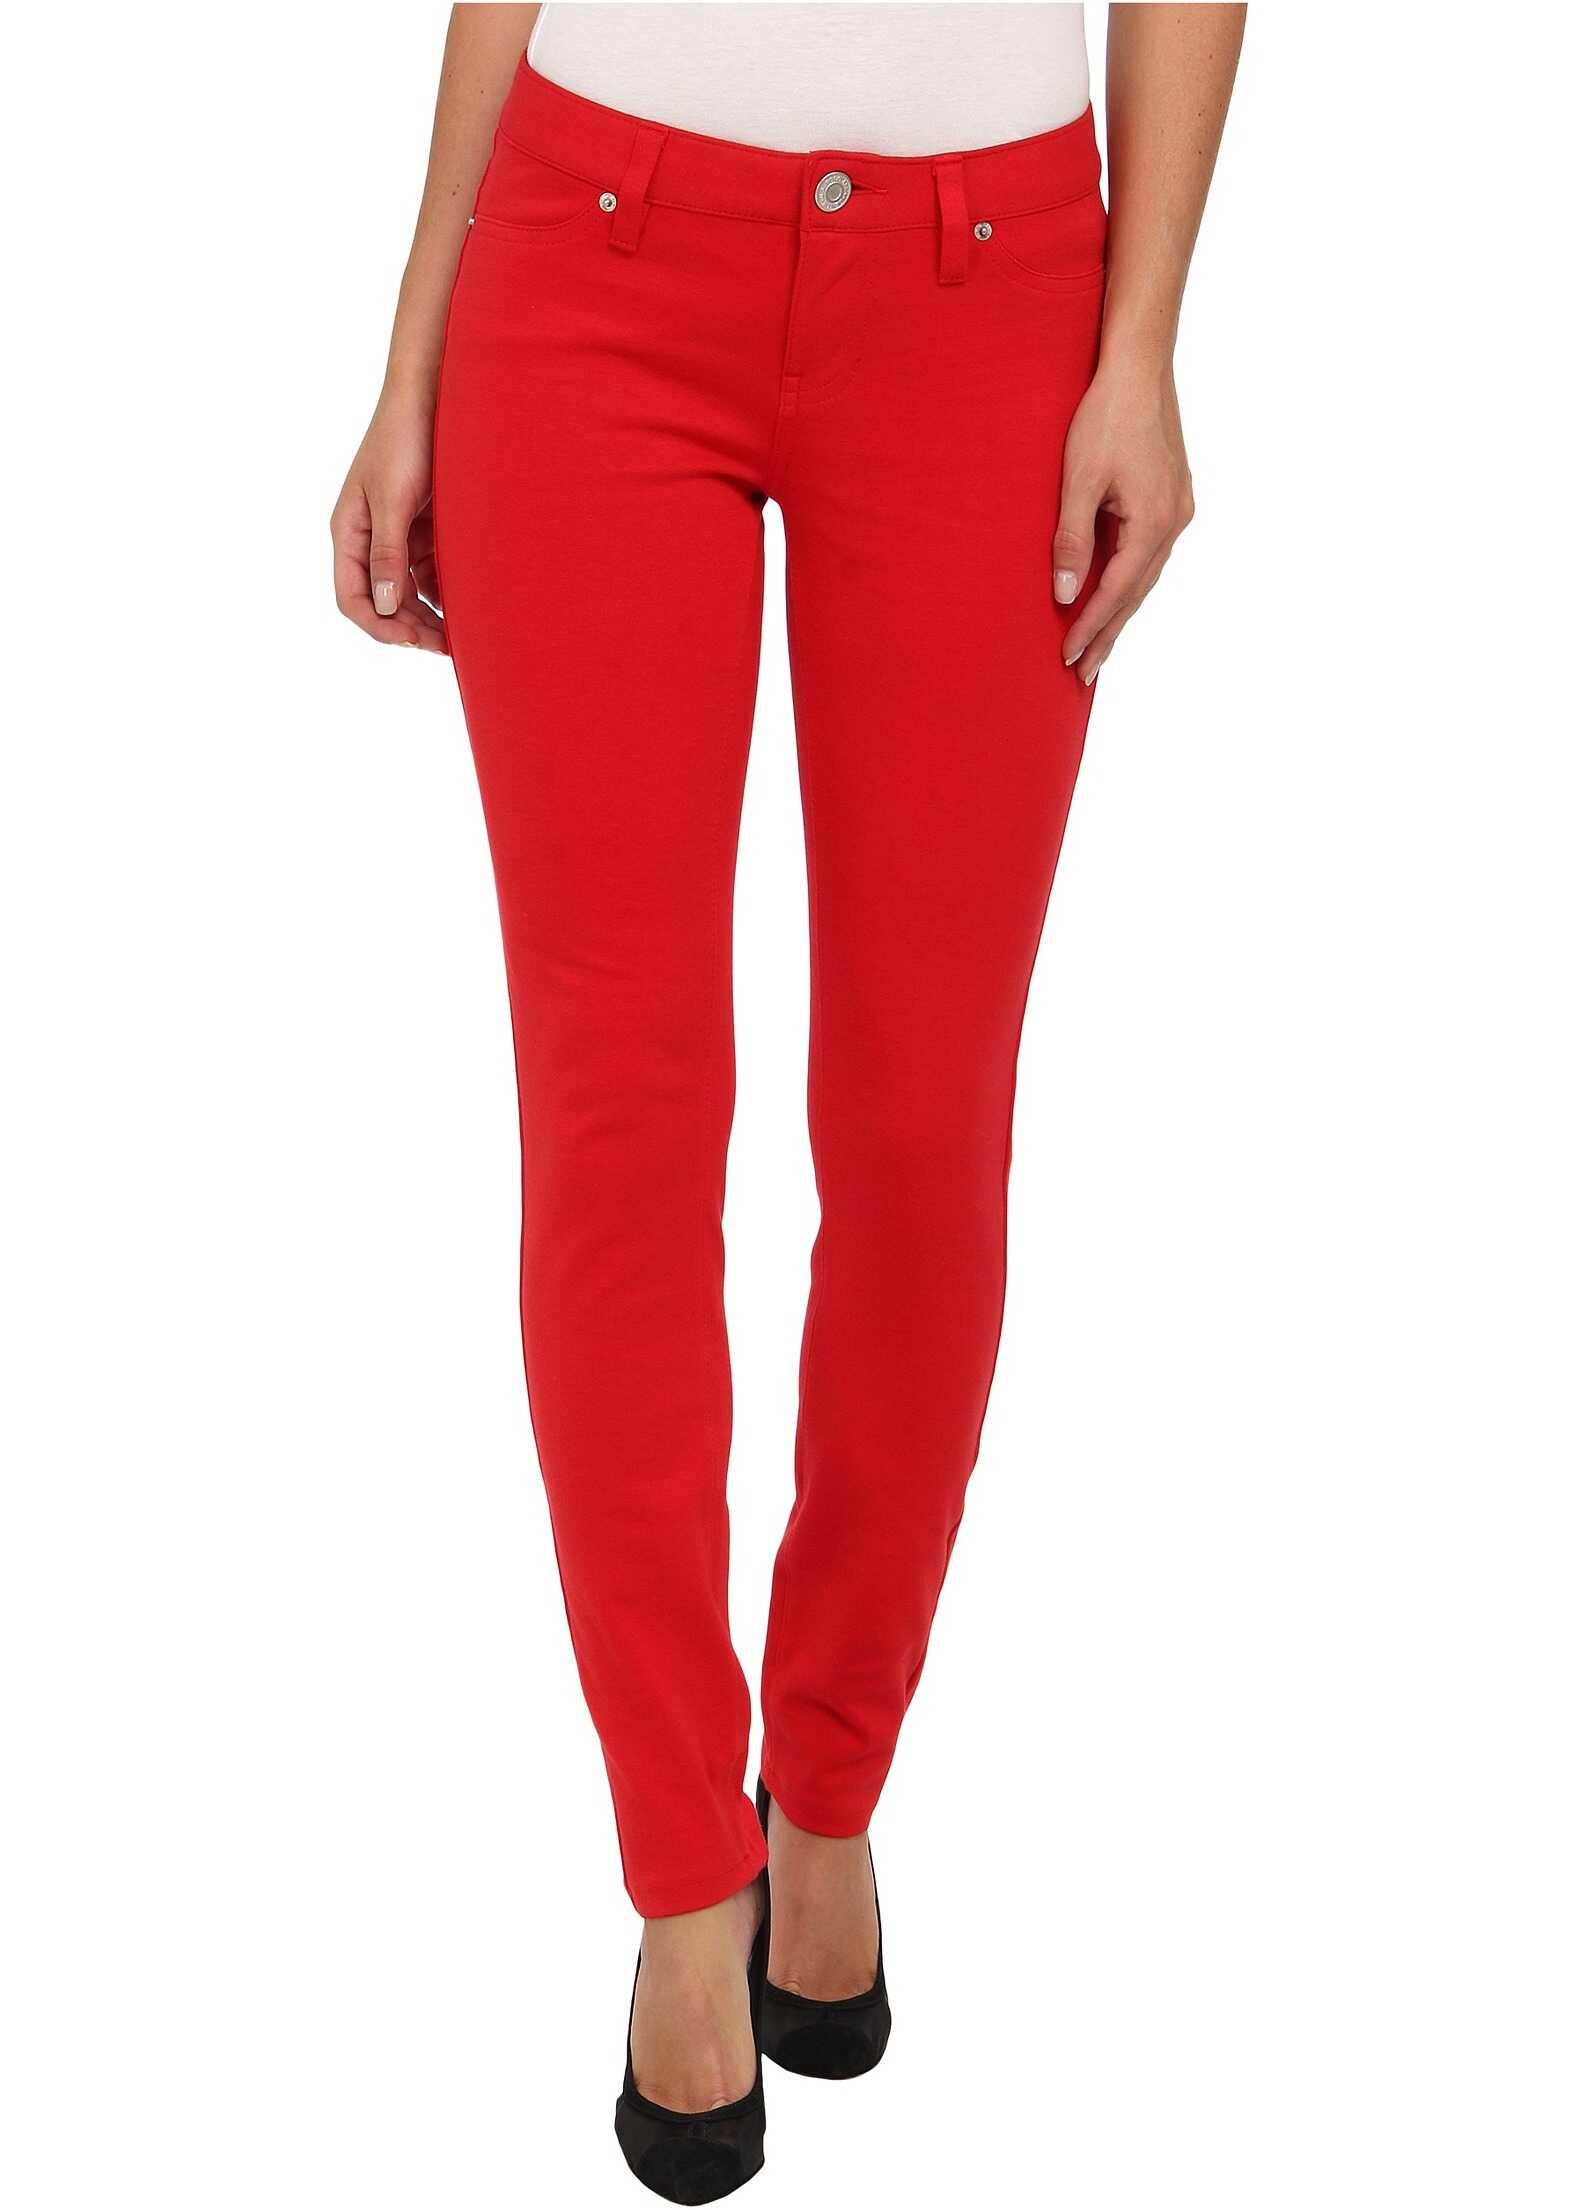 Pantaloni Femei U.s. Polo Assn. Hyper Stretch Supe